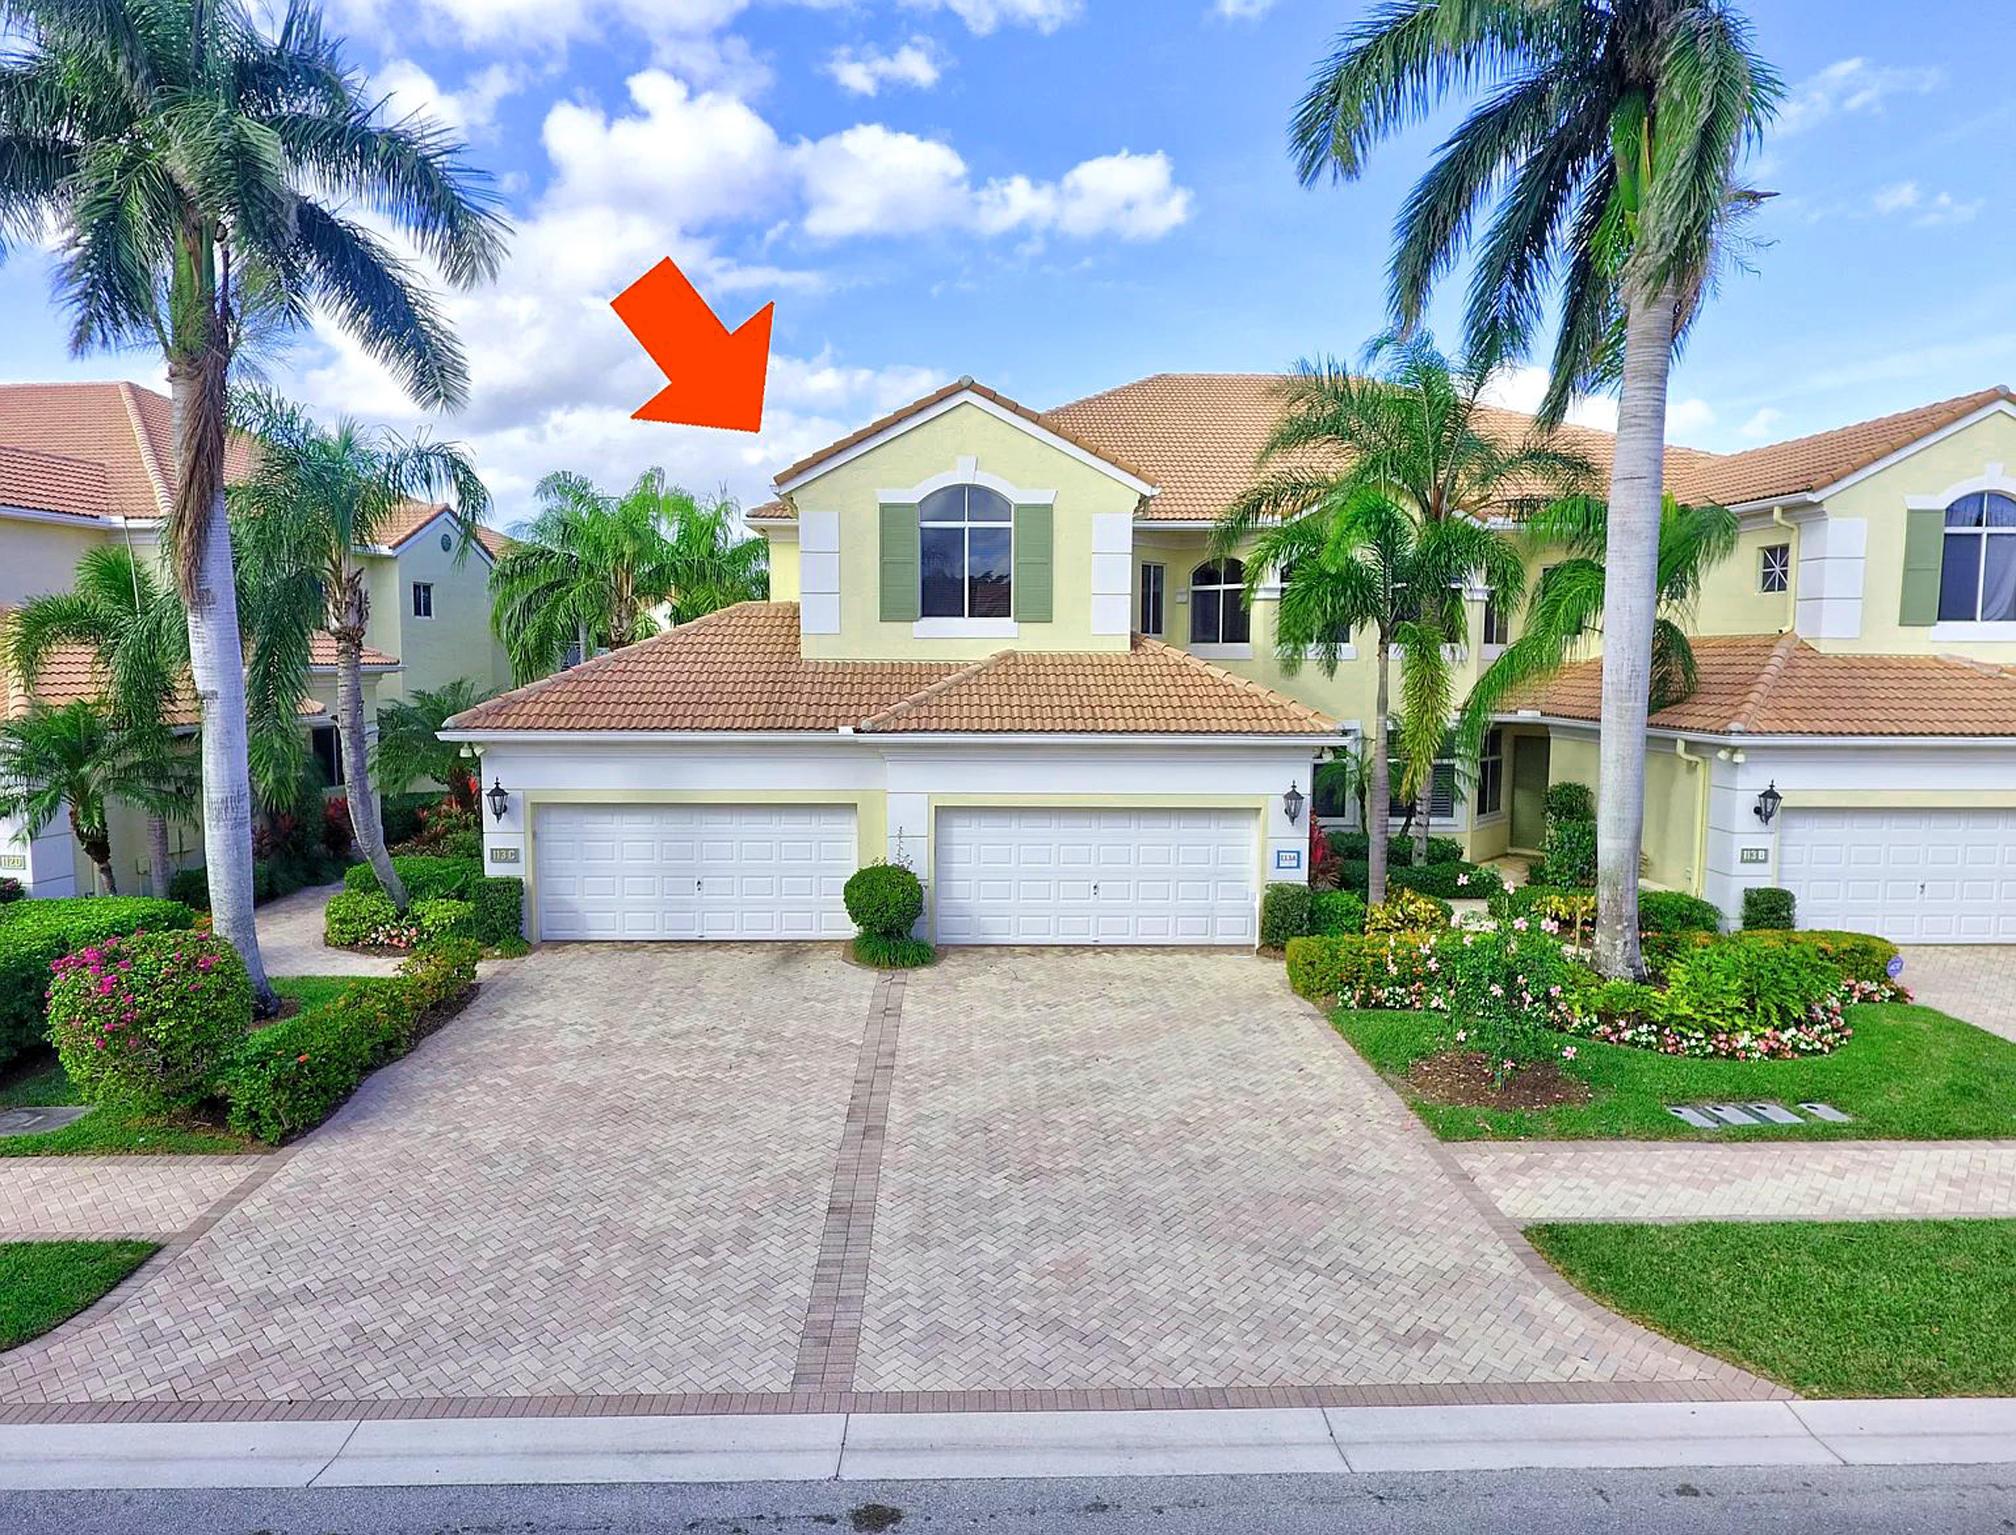 113 Palm Bay Drive C, Palm Beach Gardens, Florida 33418, 3 Bedrooms Bedrooms, ,3 BathroomsBathrooms,A,Condominium,Palm Bay,RX-10603081